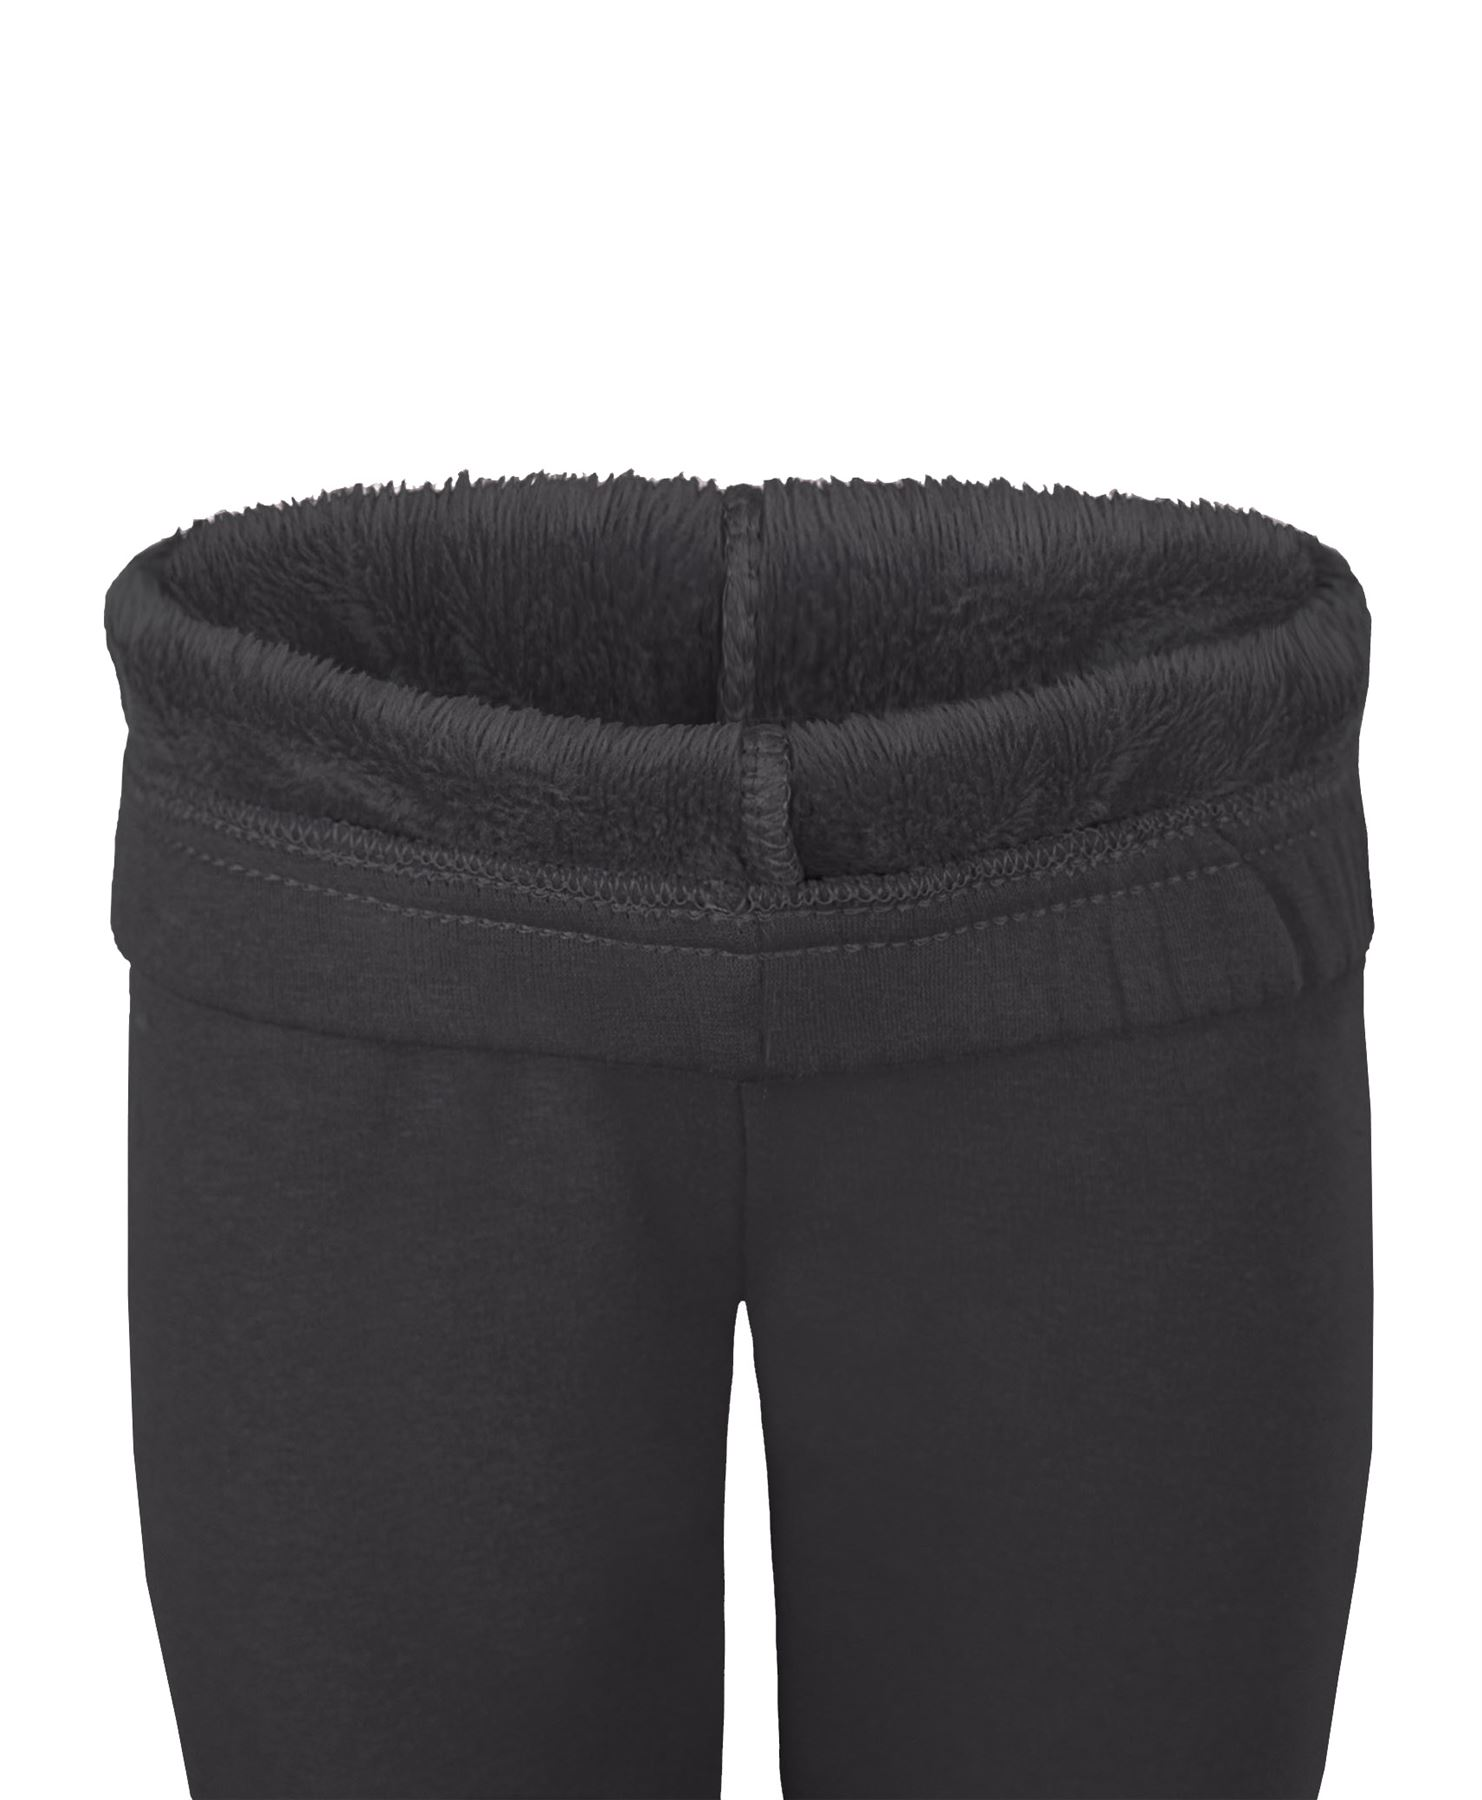 RageIT Kids Faux Fur Lined Warm Leggings Girls Soft Winter Casual Bottoms